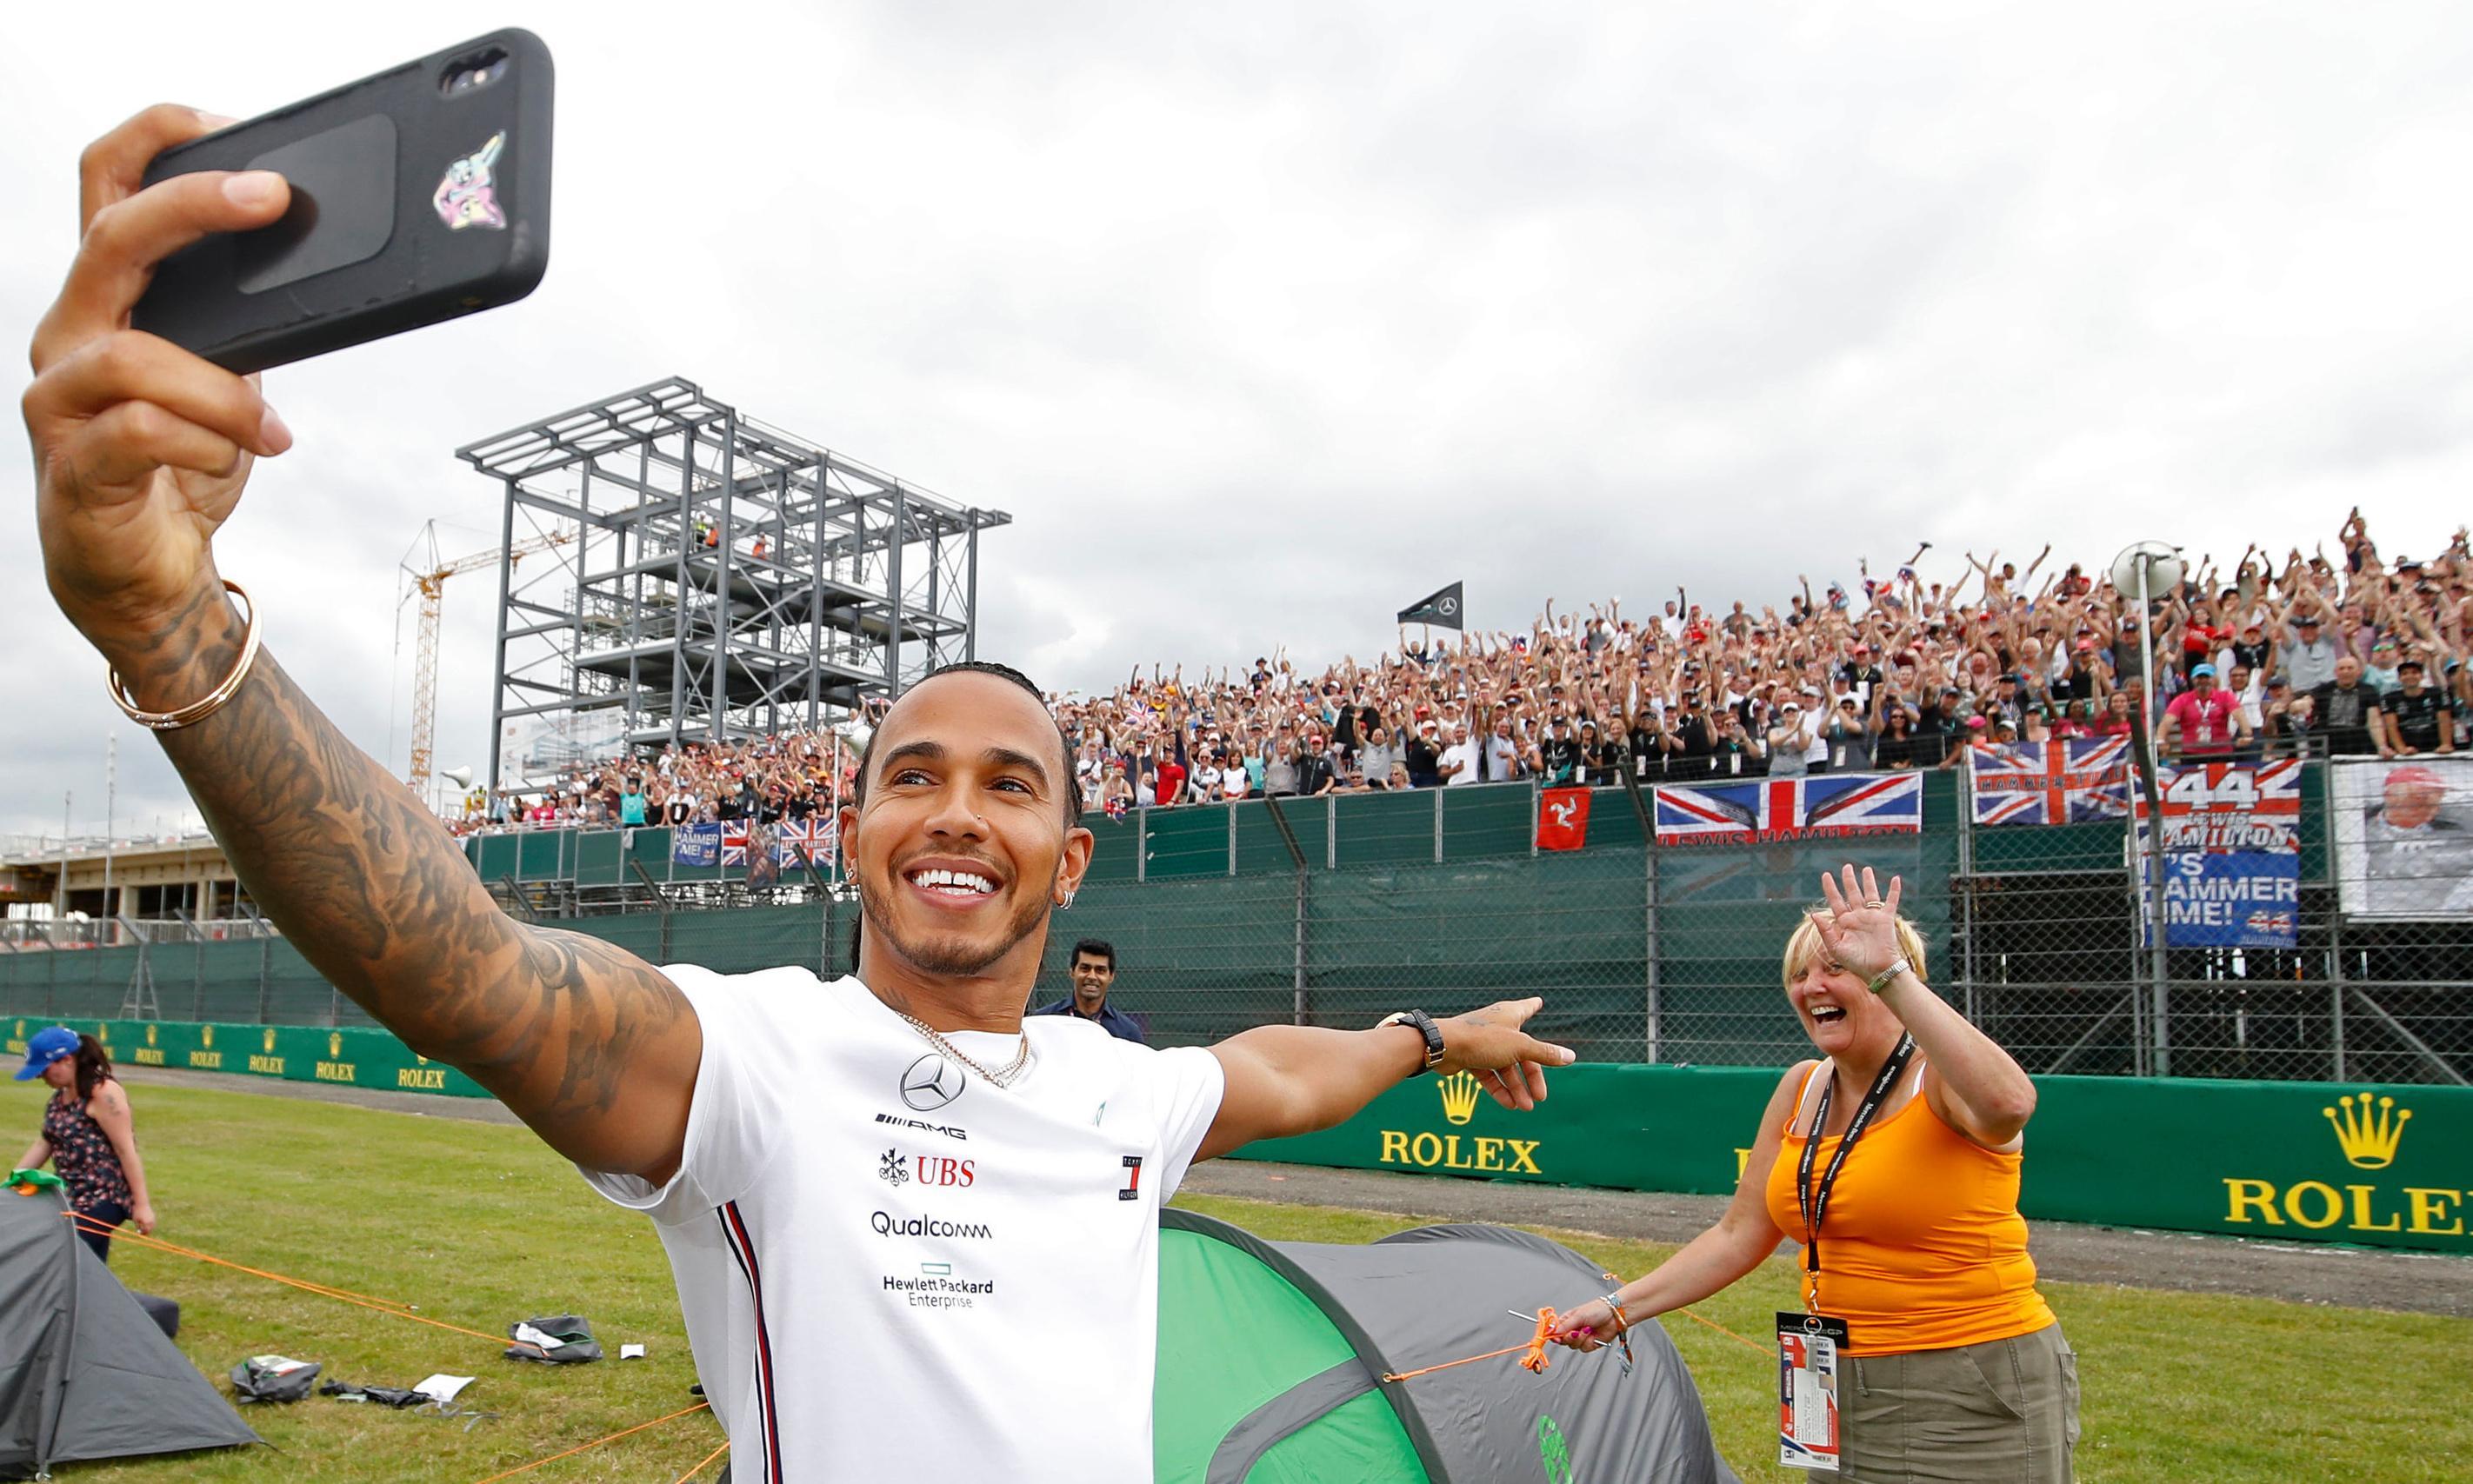 British Grand Prix should not clash with Wimbledon, says Lewis Hamilton